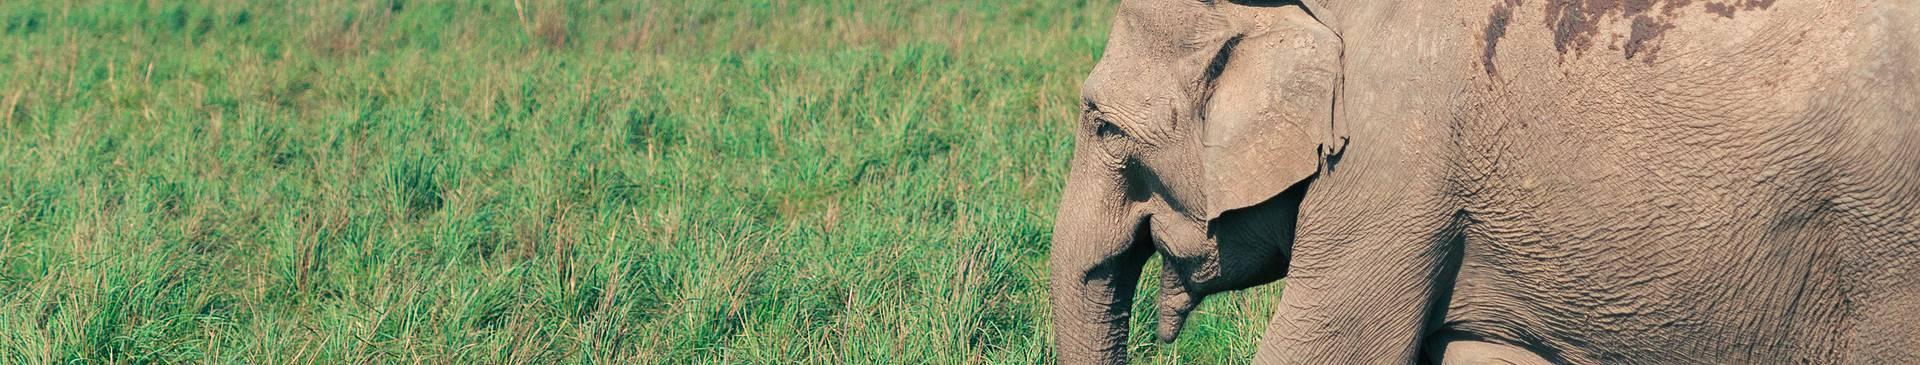 Safari Reisen Indien